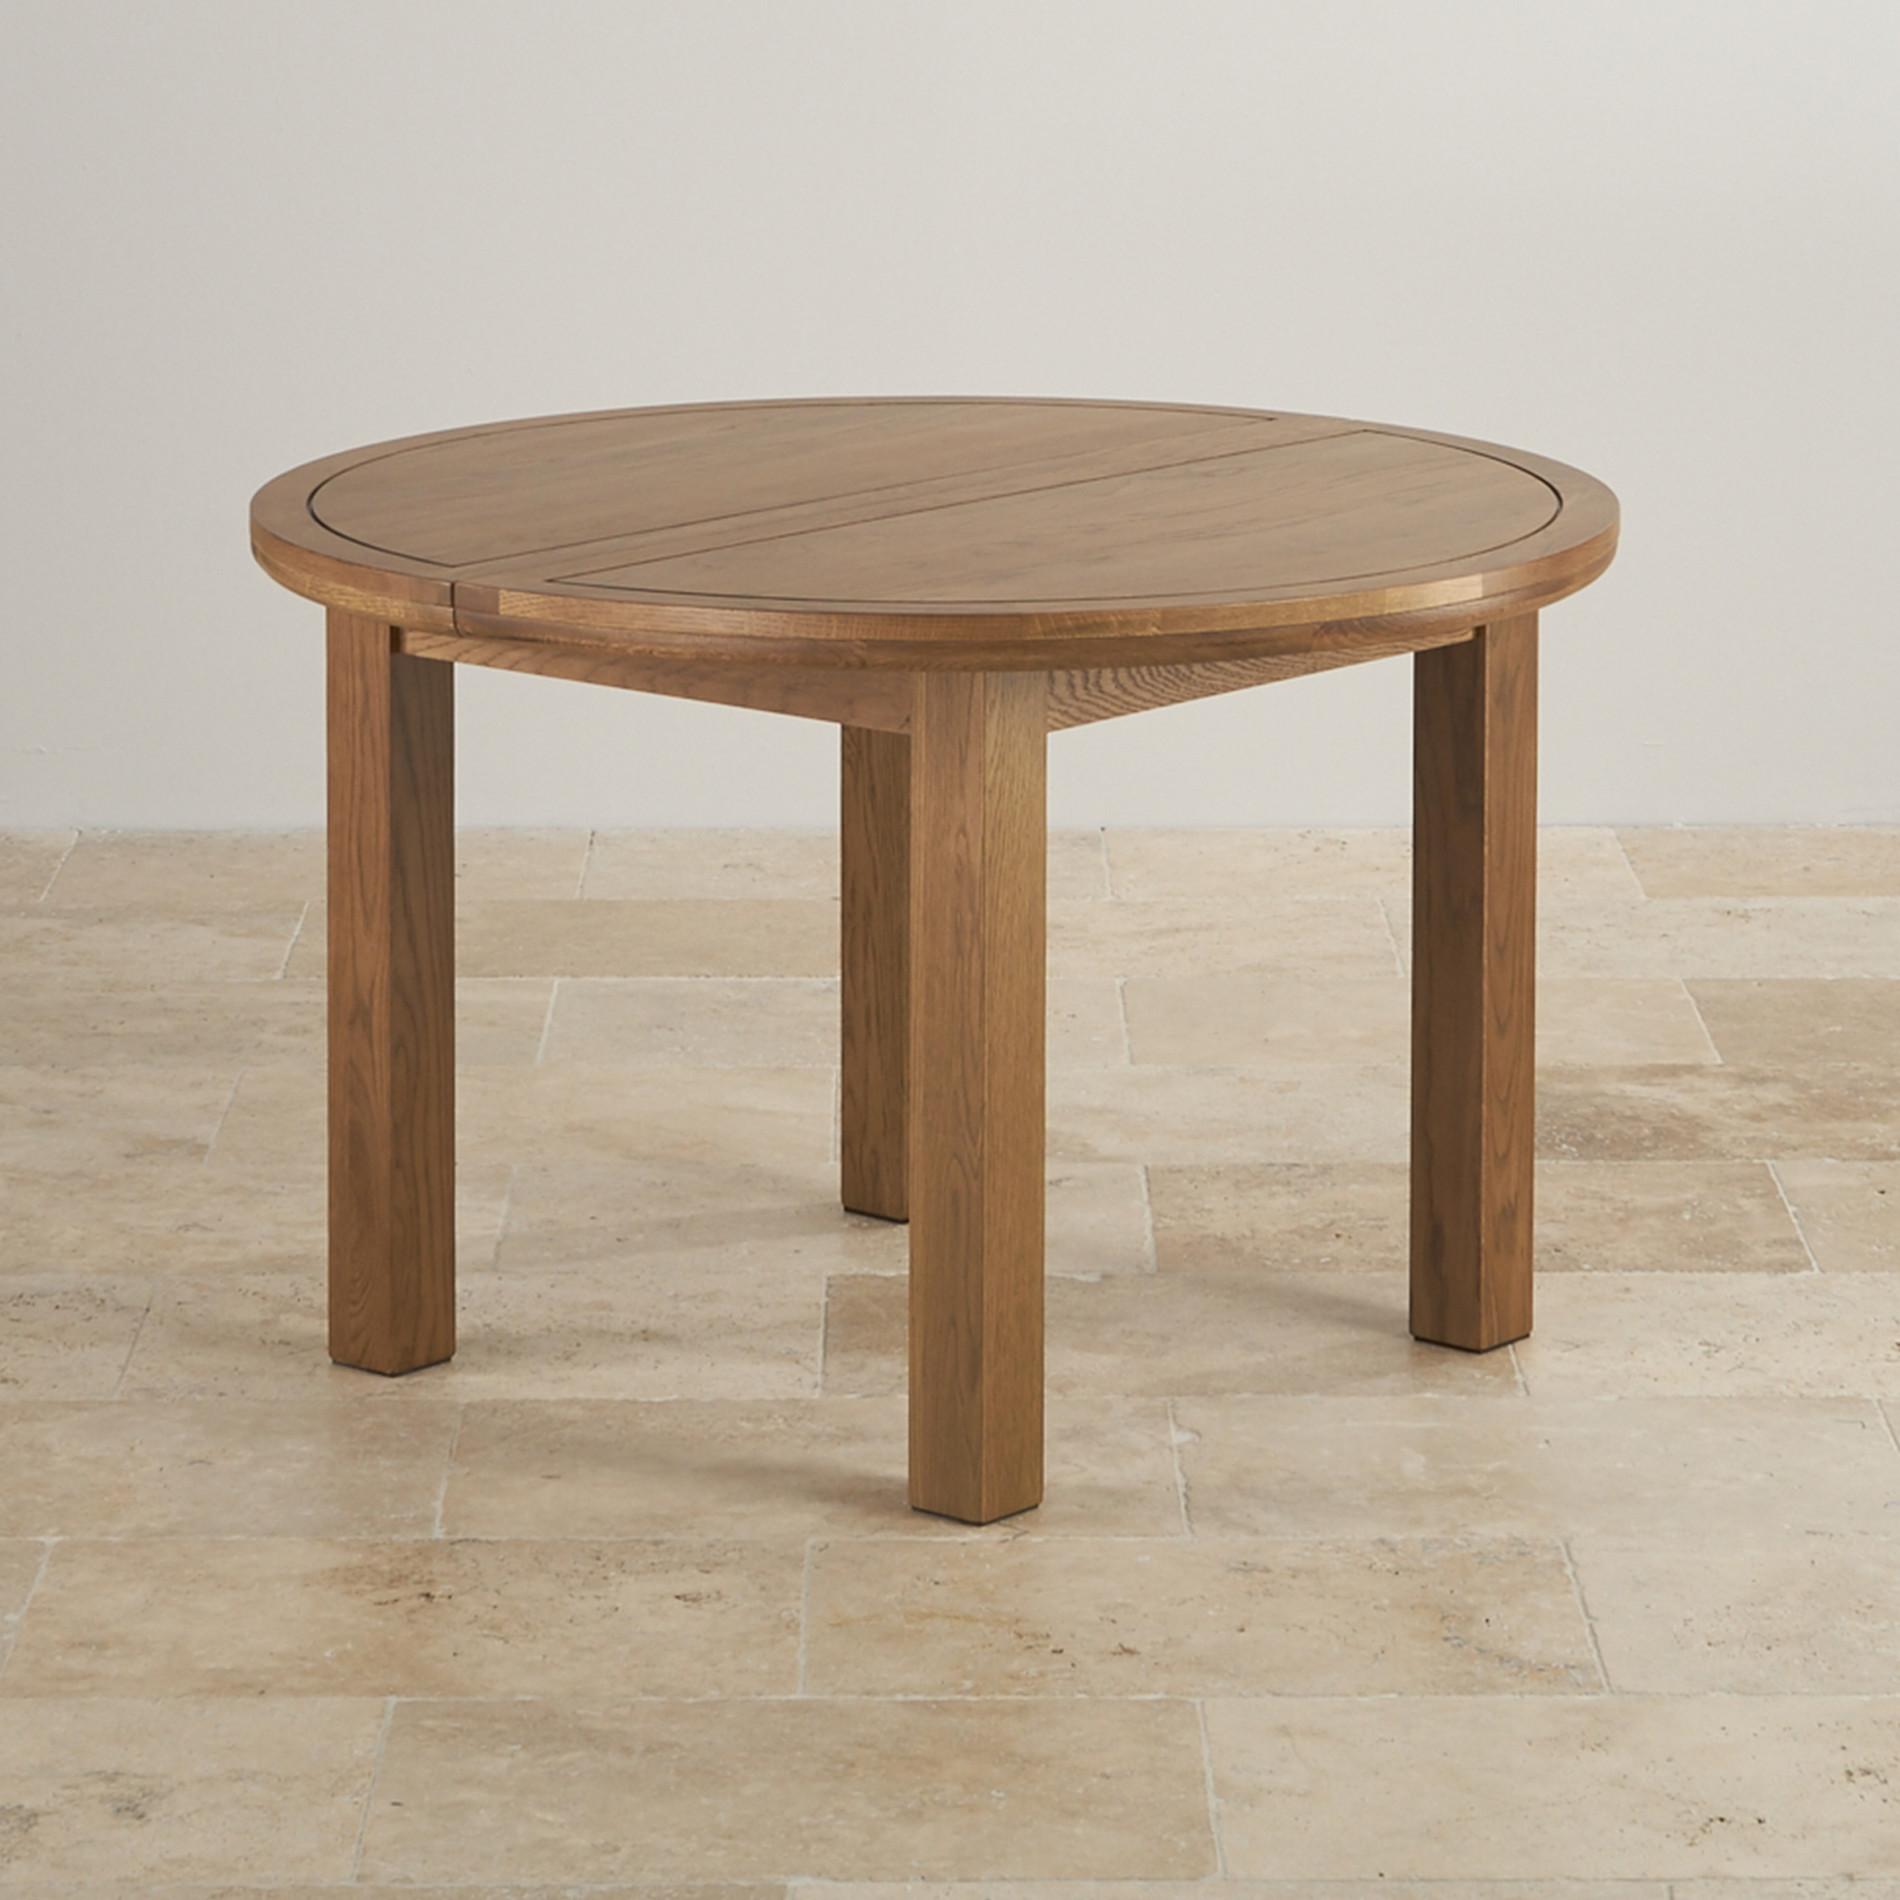 Round extending dining table in rustic oak oak furniture land - Round extending dining table ...